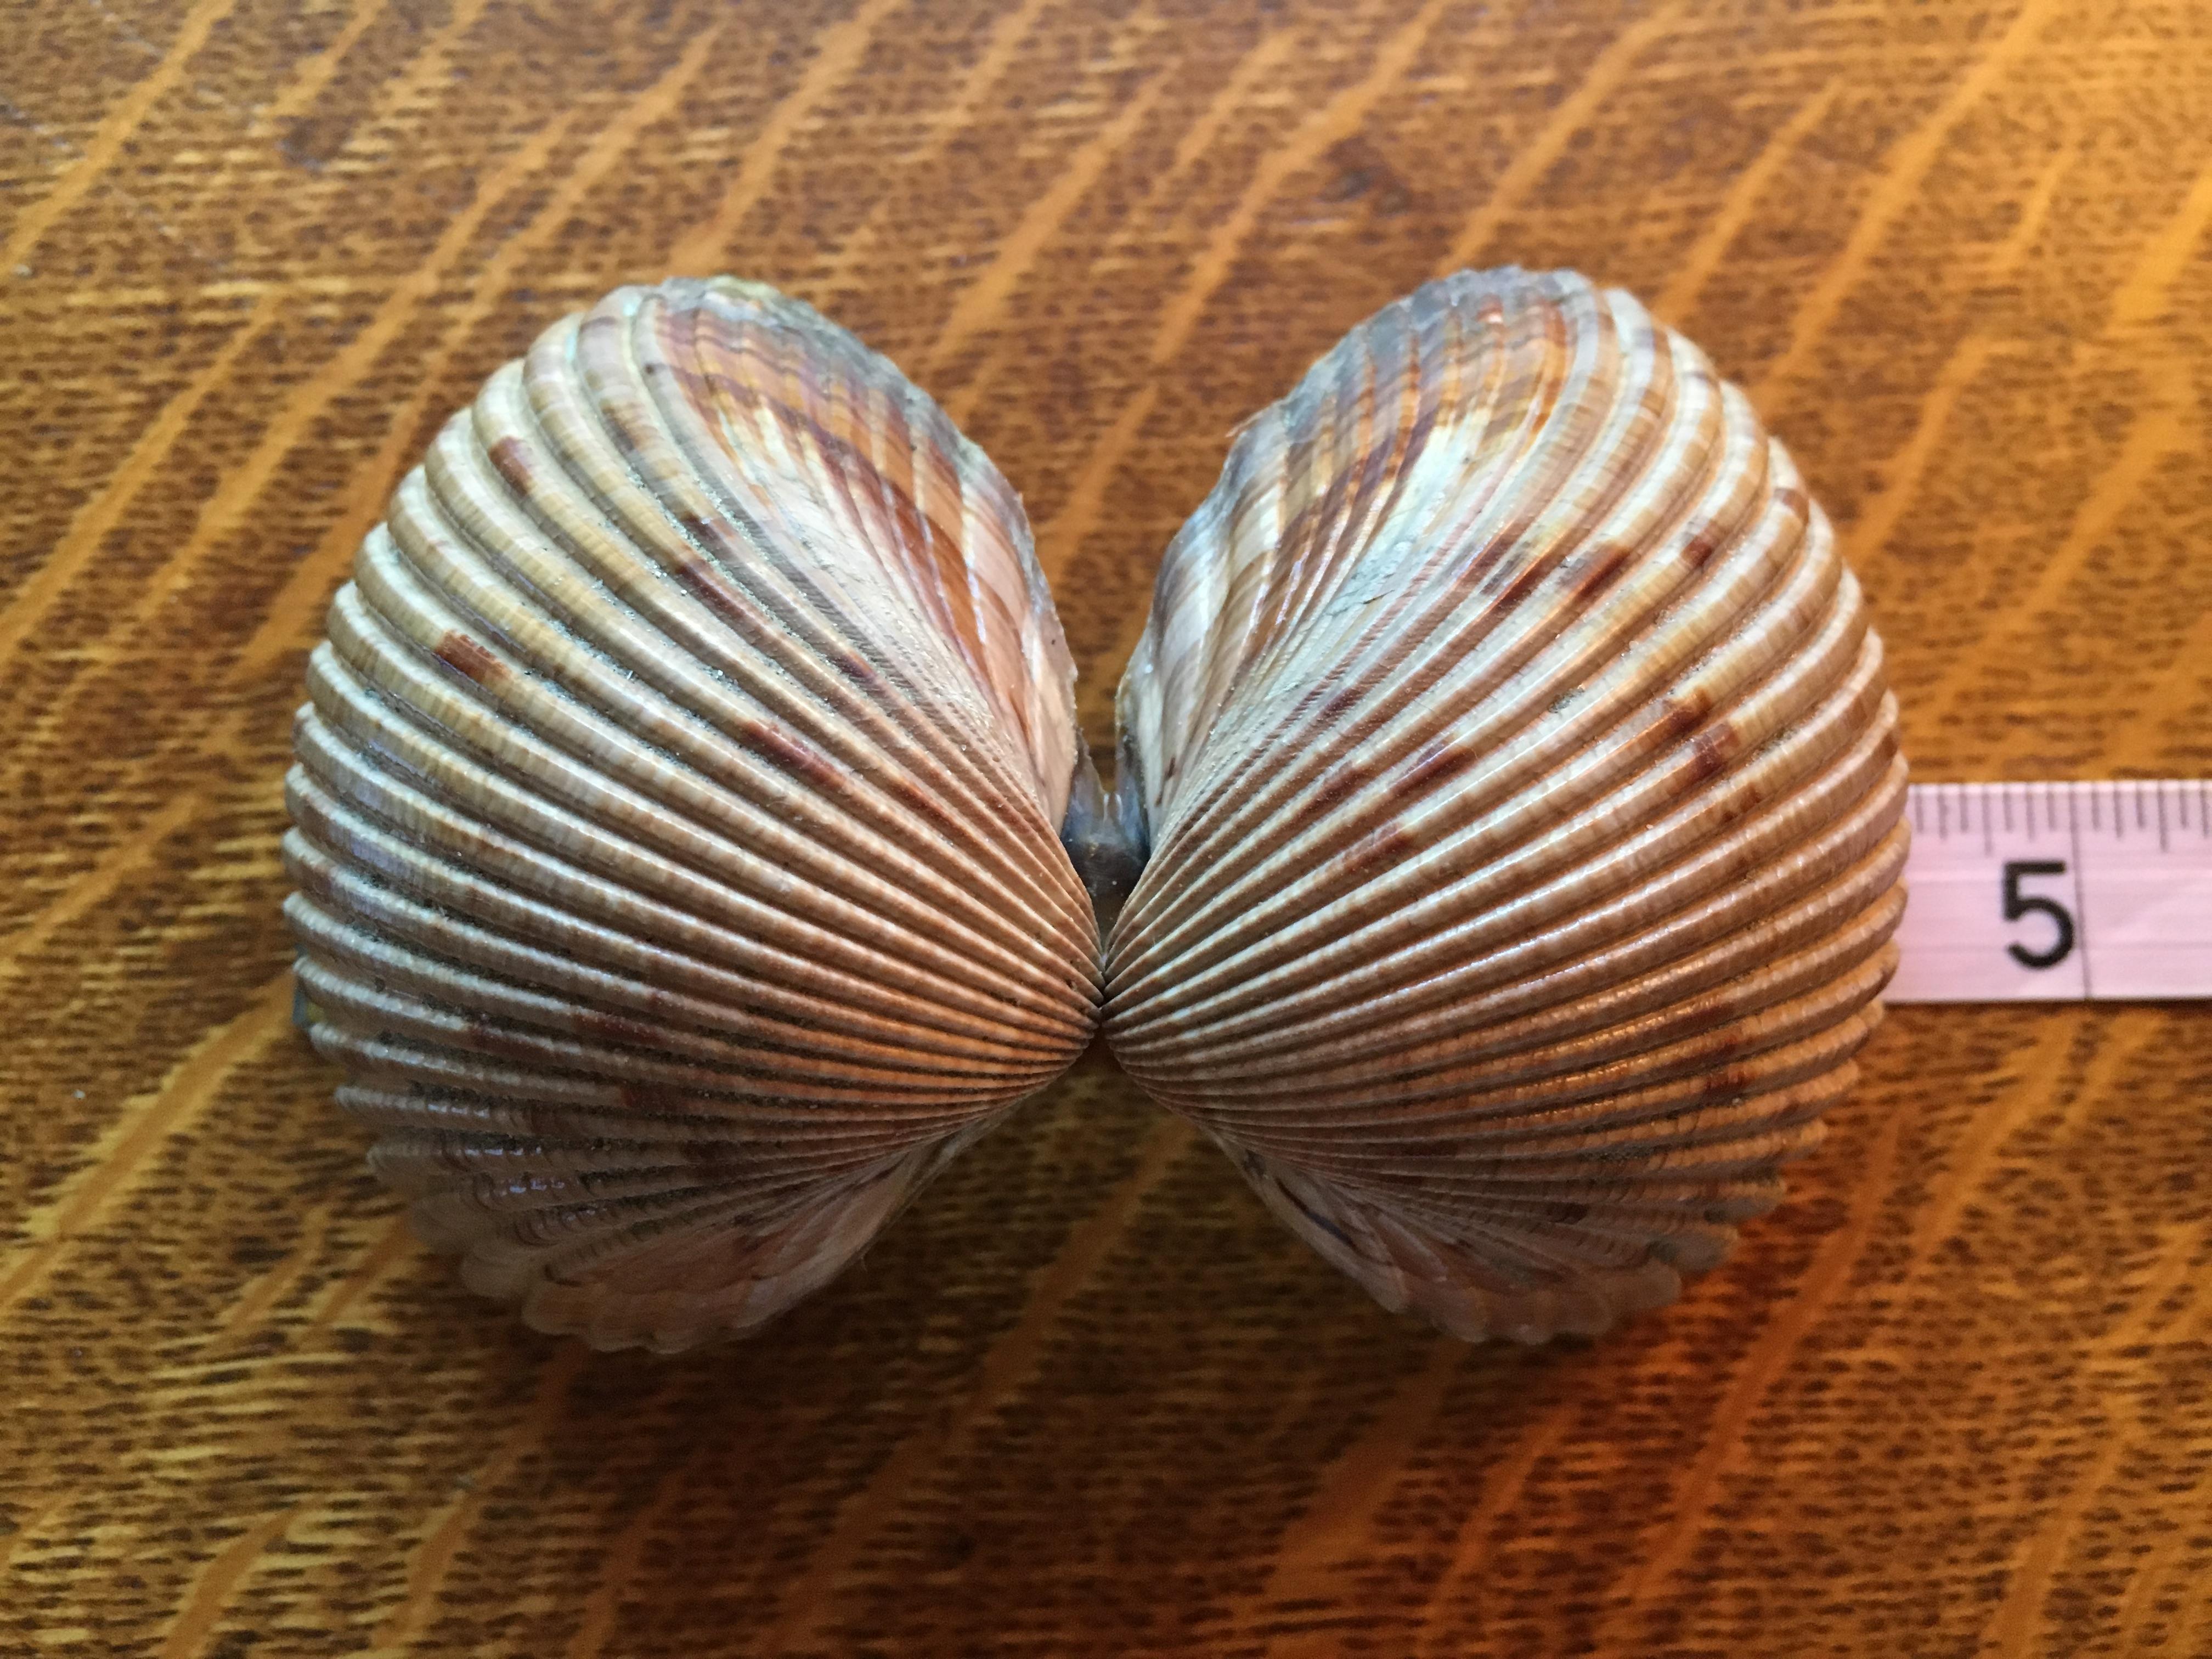 atlantic giant cockle shell bivalve